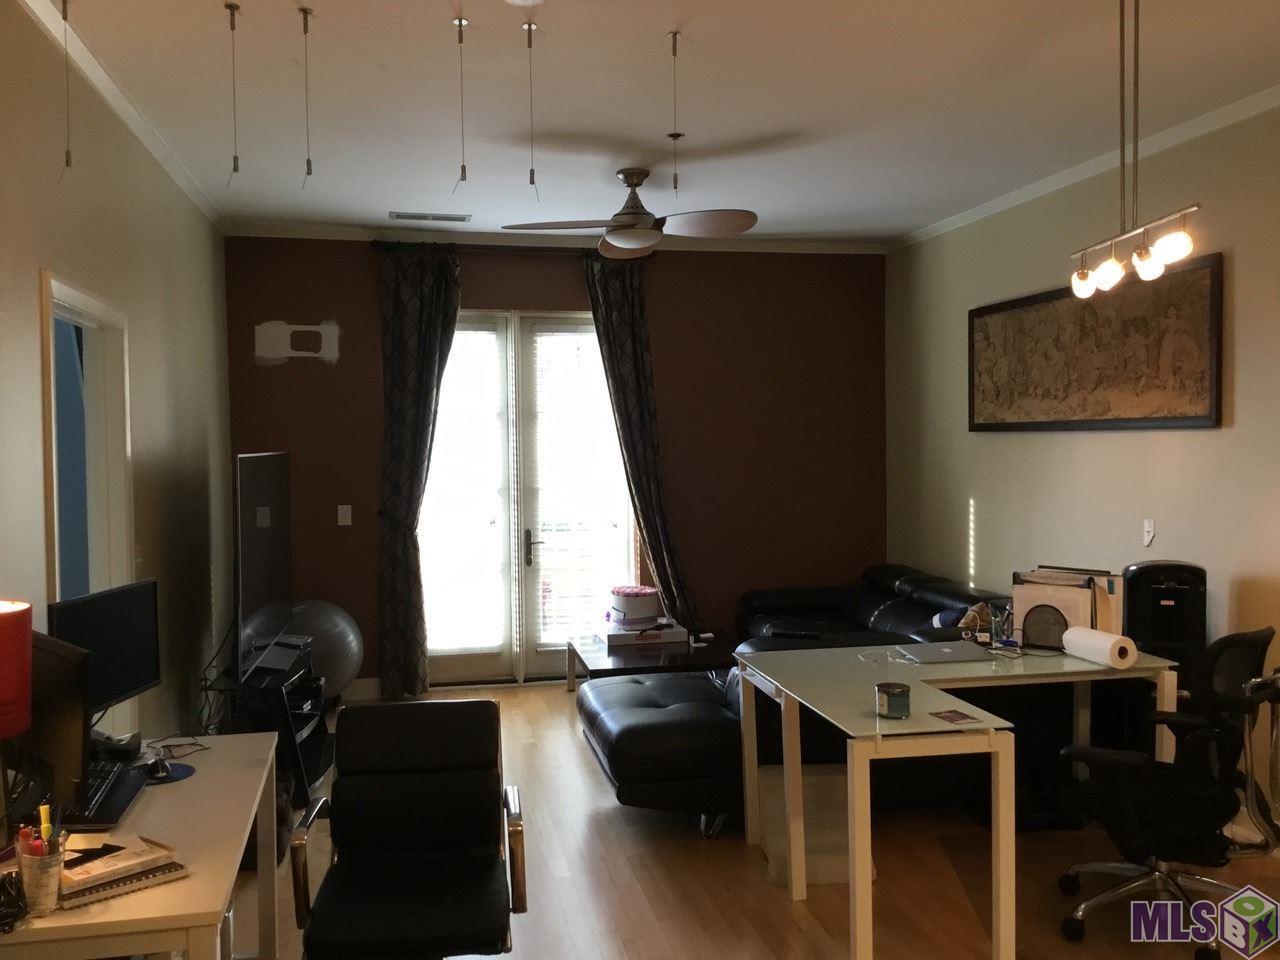 https://bt-photos.global.ssl.fastly.net/batonrouge/orig_boomver_2_2019001405-2.jpg